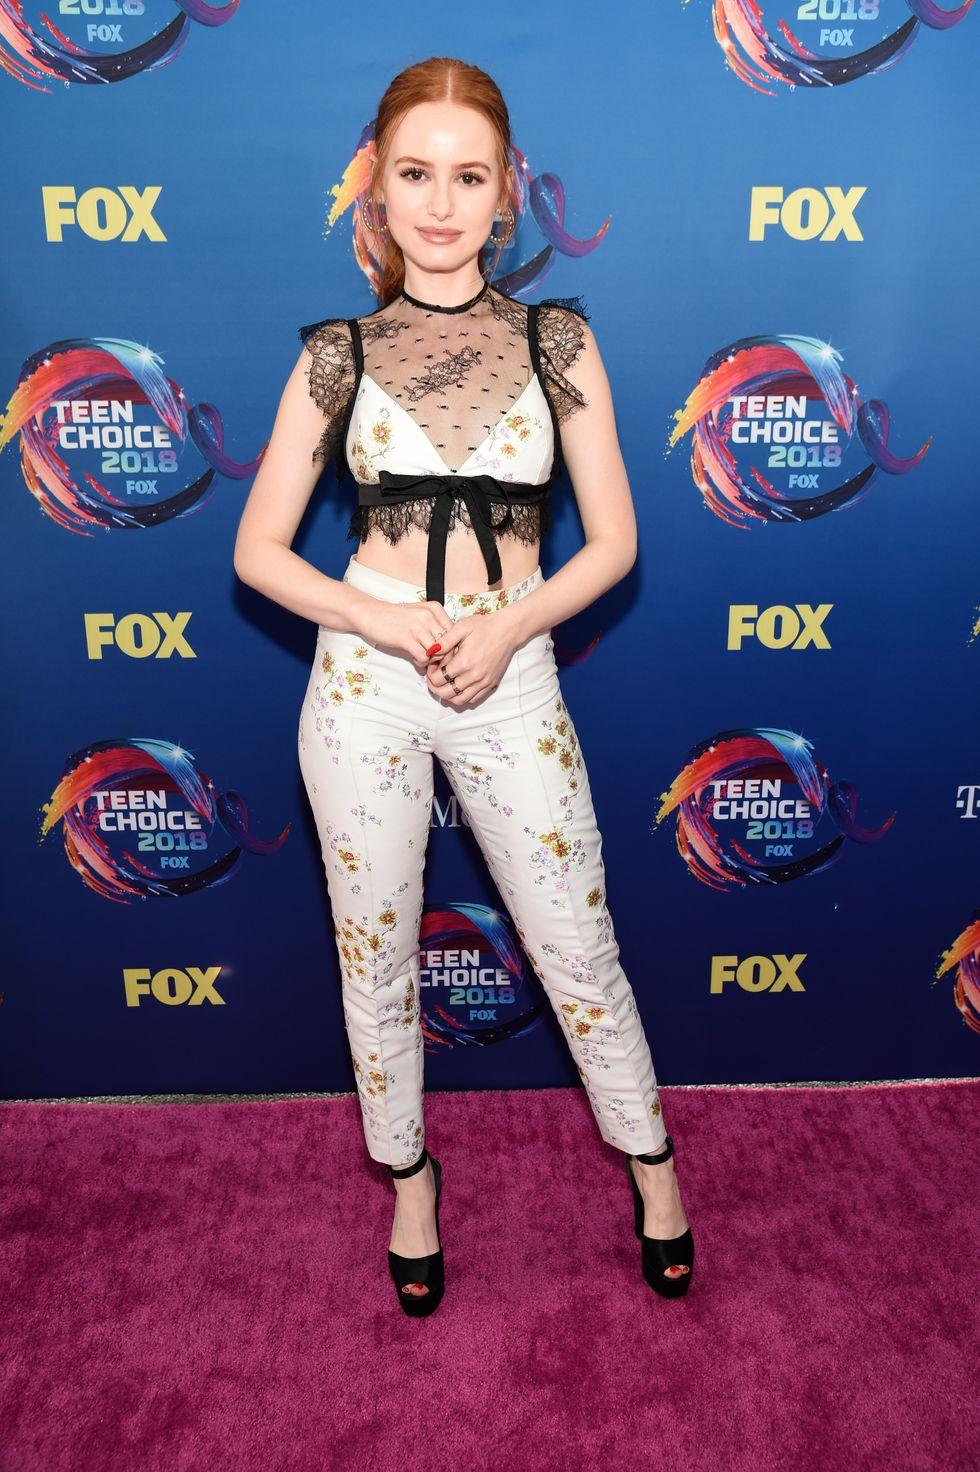 Który outfit z #TeenChoice?   #RT Madelaine Petsch #FAV Meghan Trainor https://t.co/LV52qRrwgw